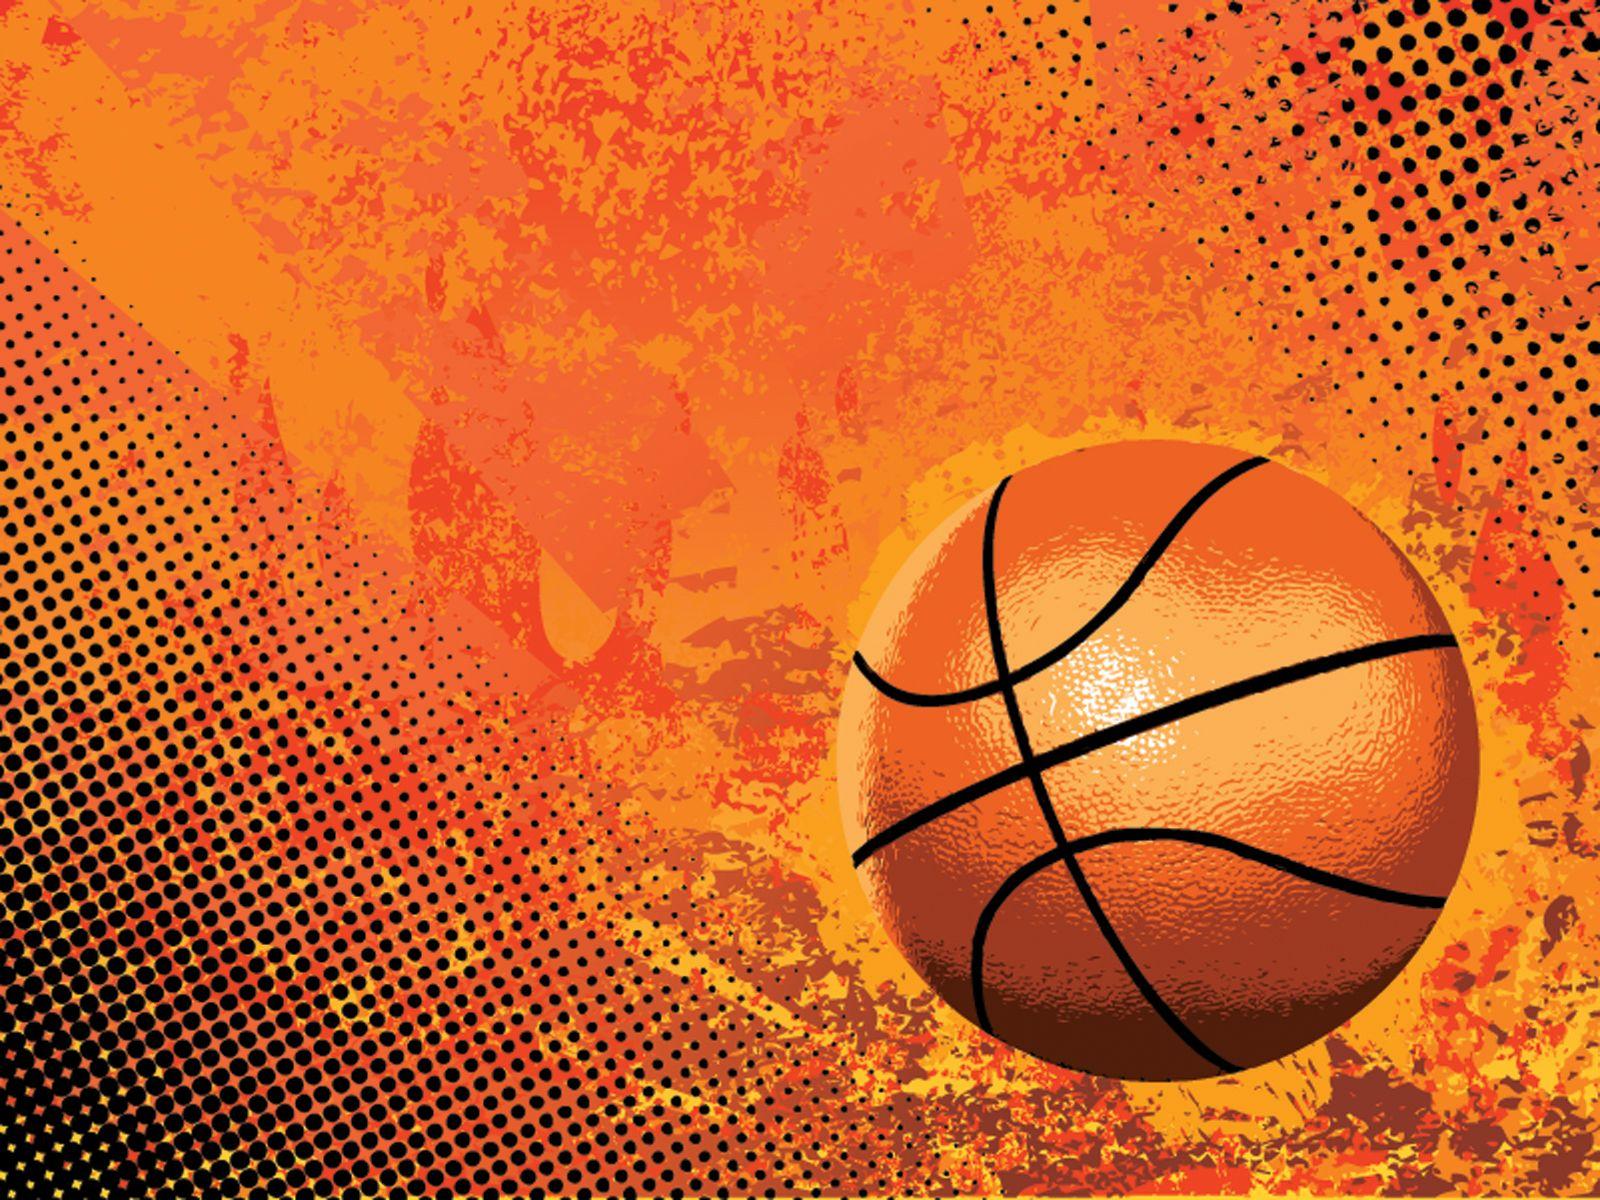 cartoon basketball wallpaper wallpaperxy com cartoon